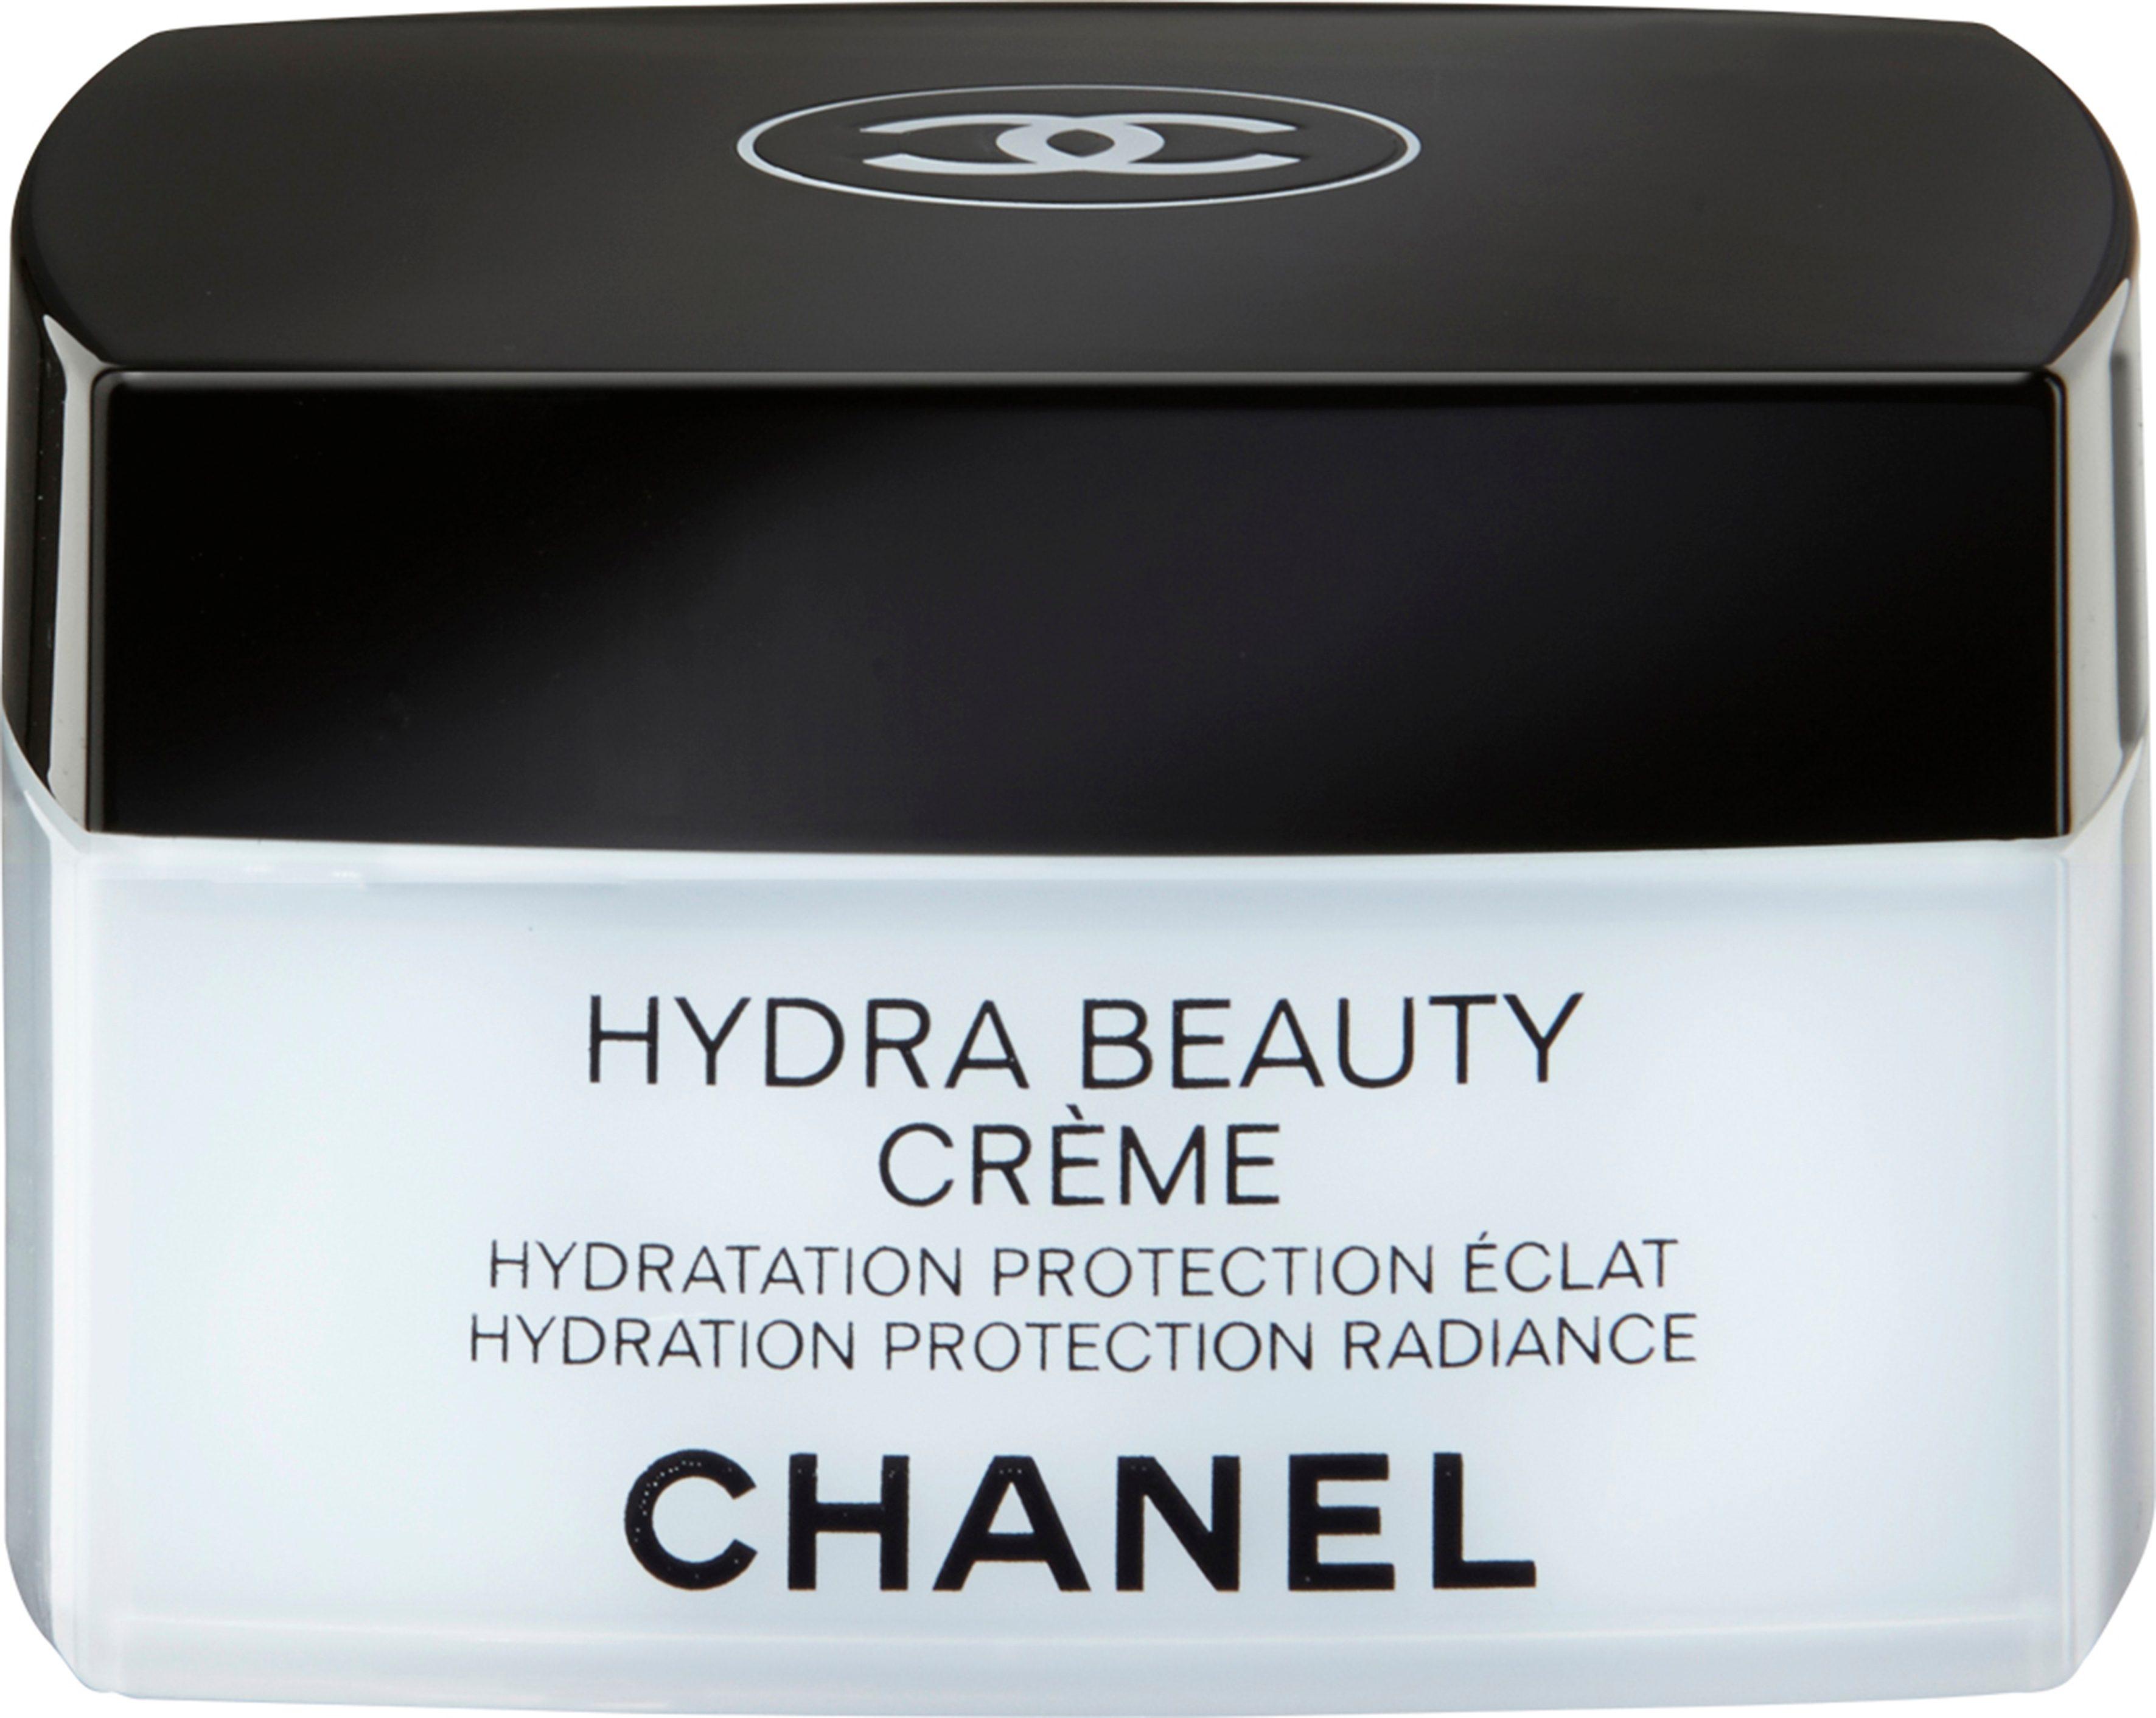 Chanel, »Hydra Beauty Crème«, Gesichtscreme